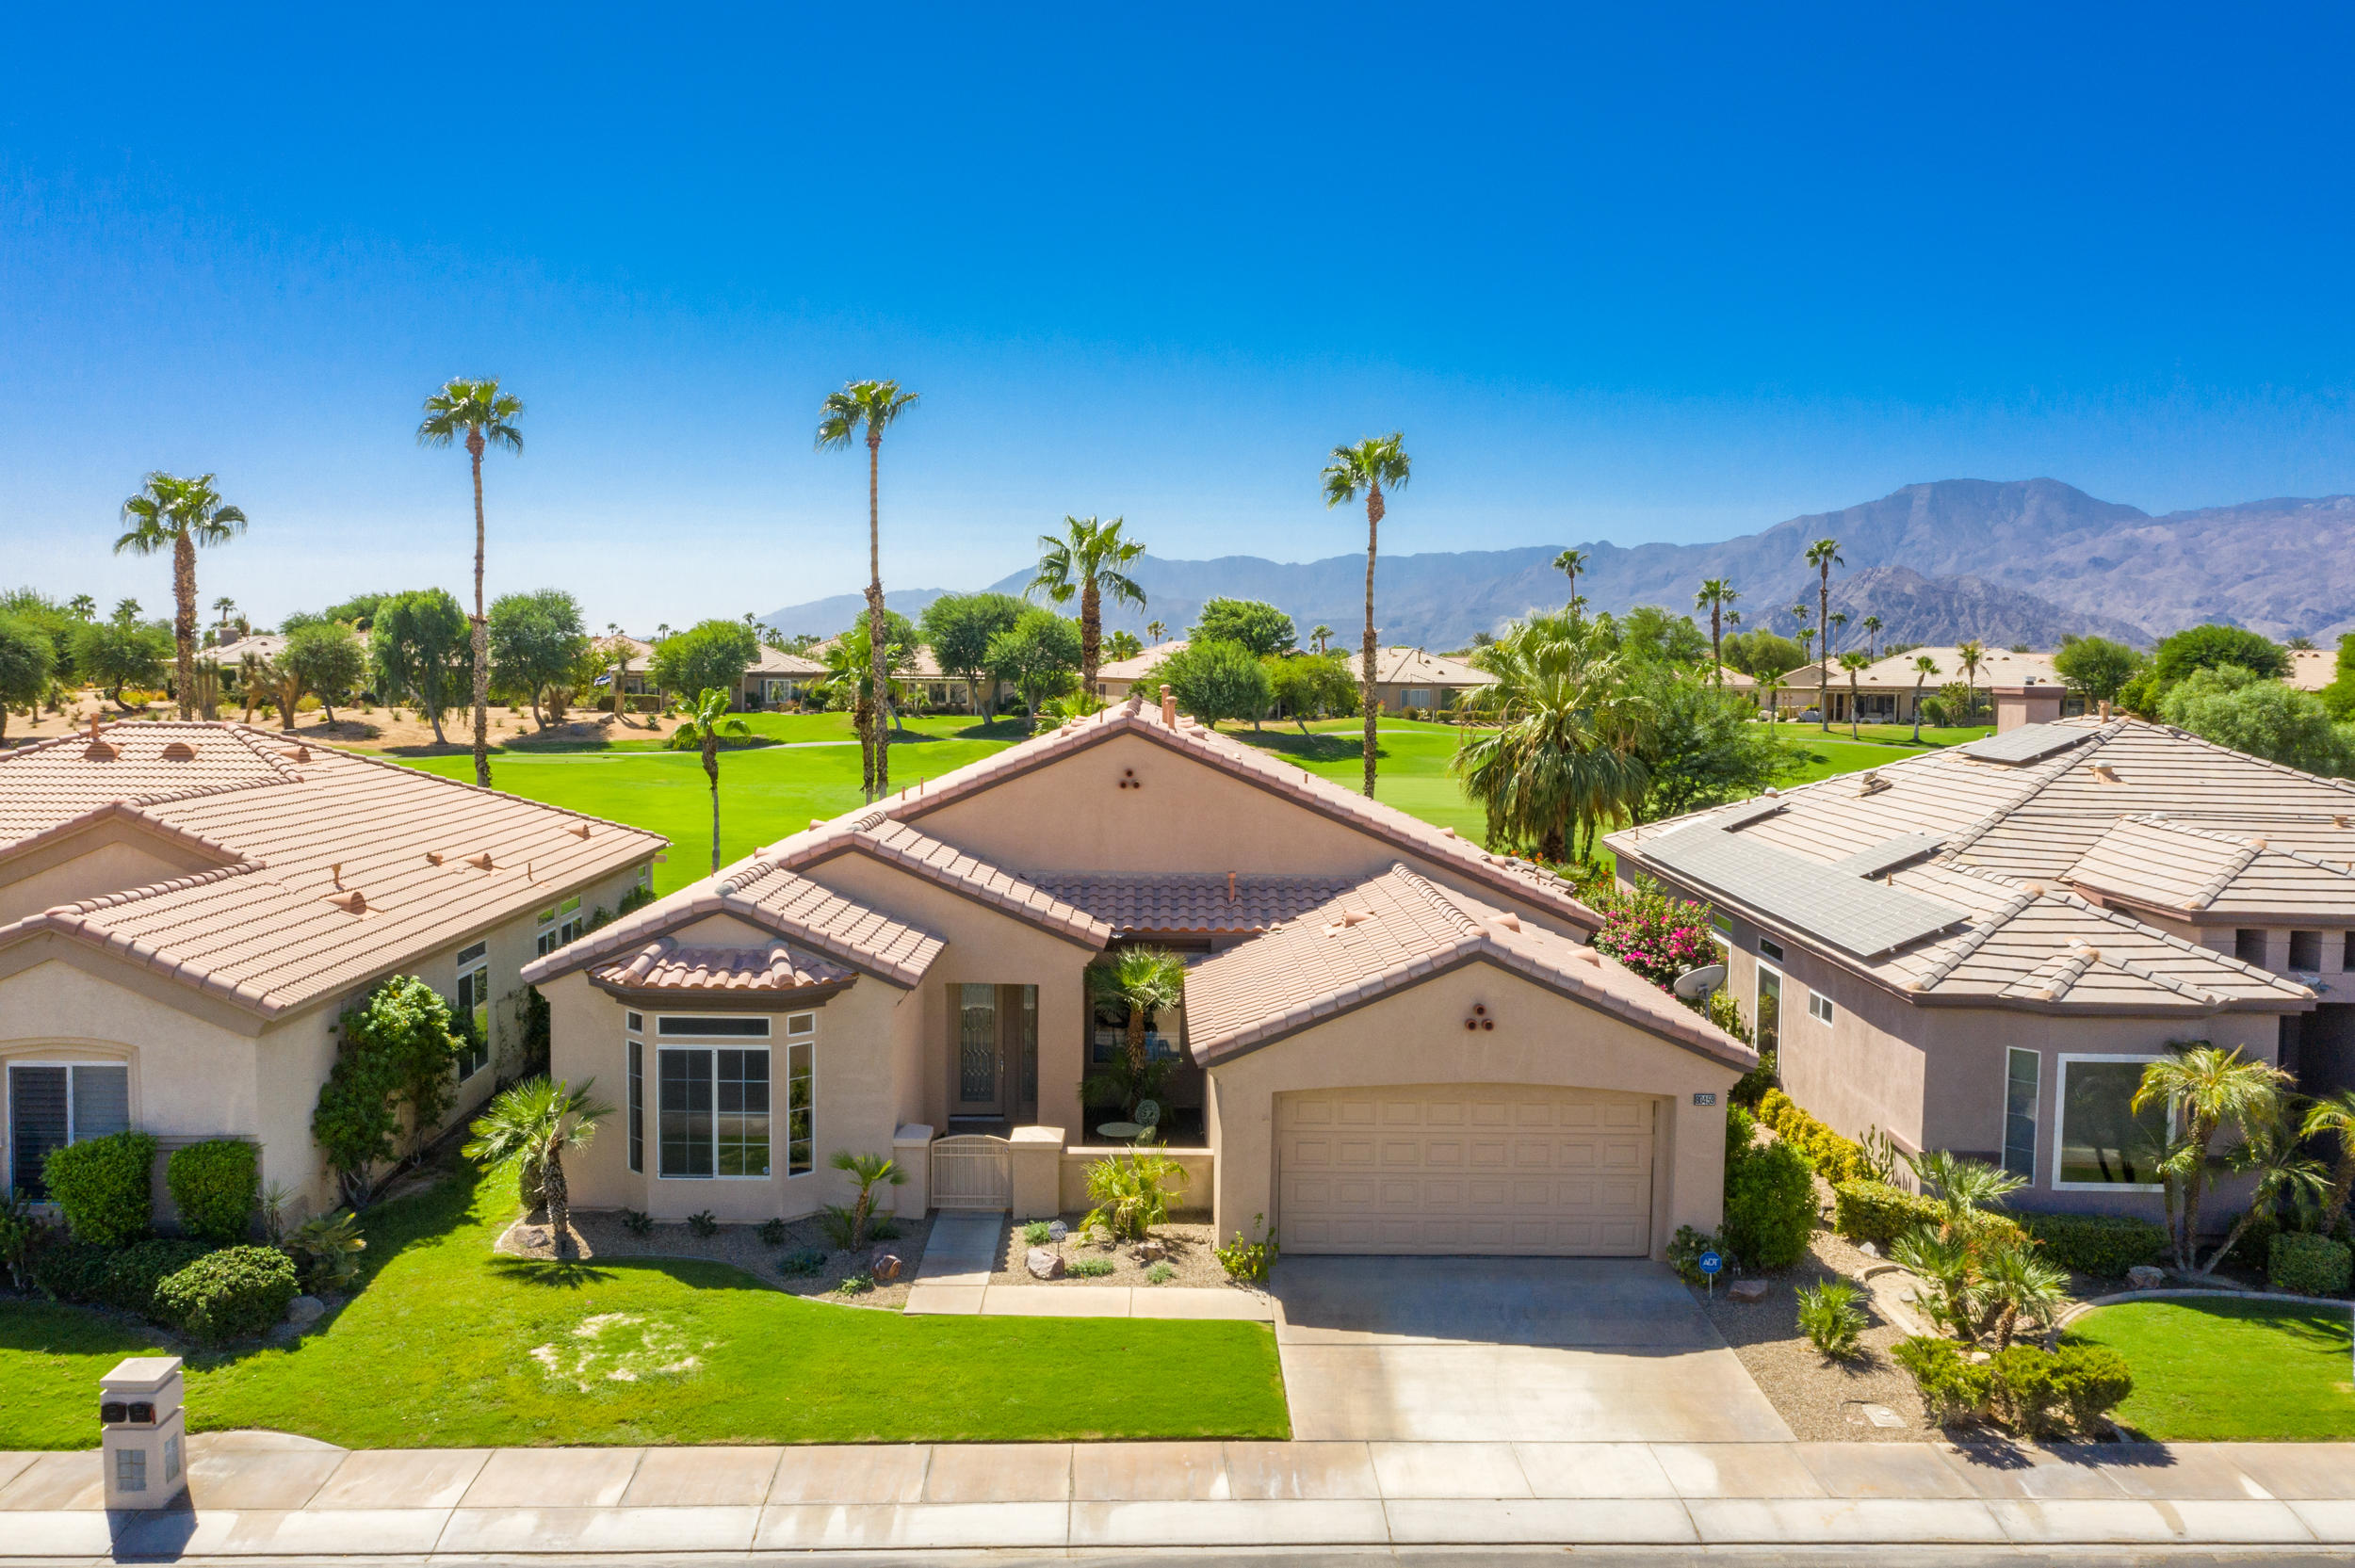 Photo of 80459 Muirfield Drive, Indio, CA 92201